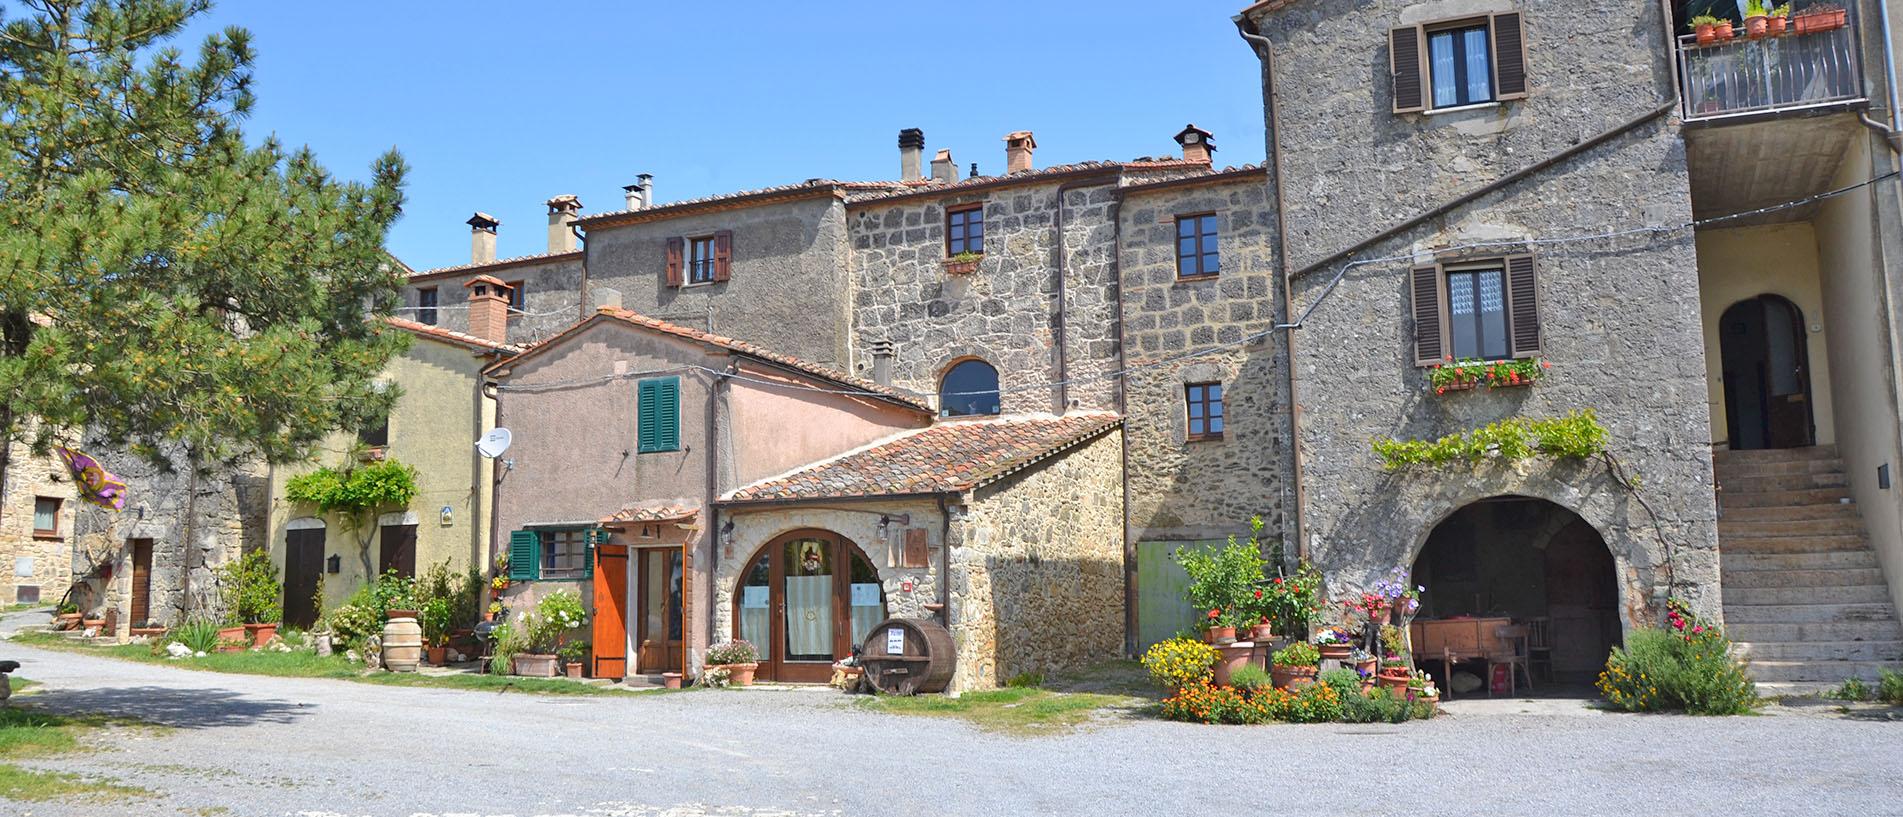 Agriturismo a Sarteano Fonte Vetriana, Farmhouse in Sarteano Fonte Vetriana